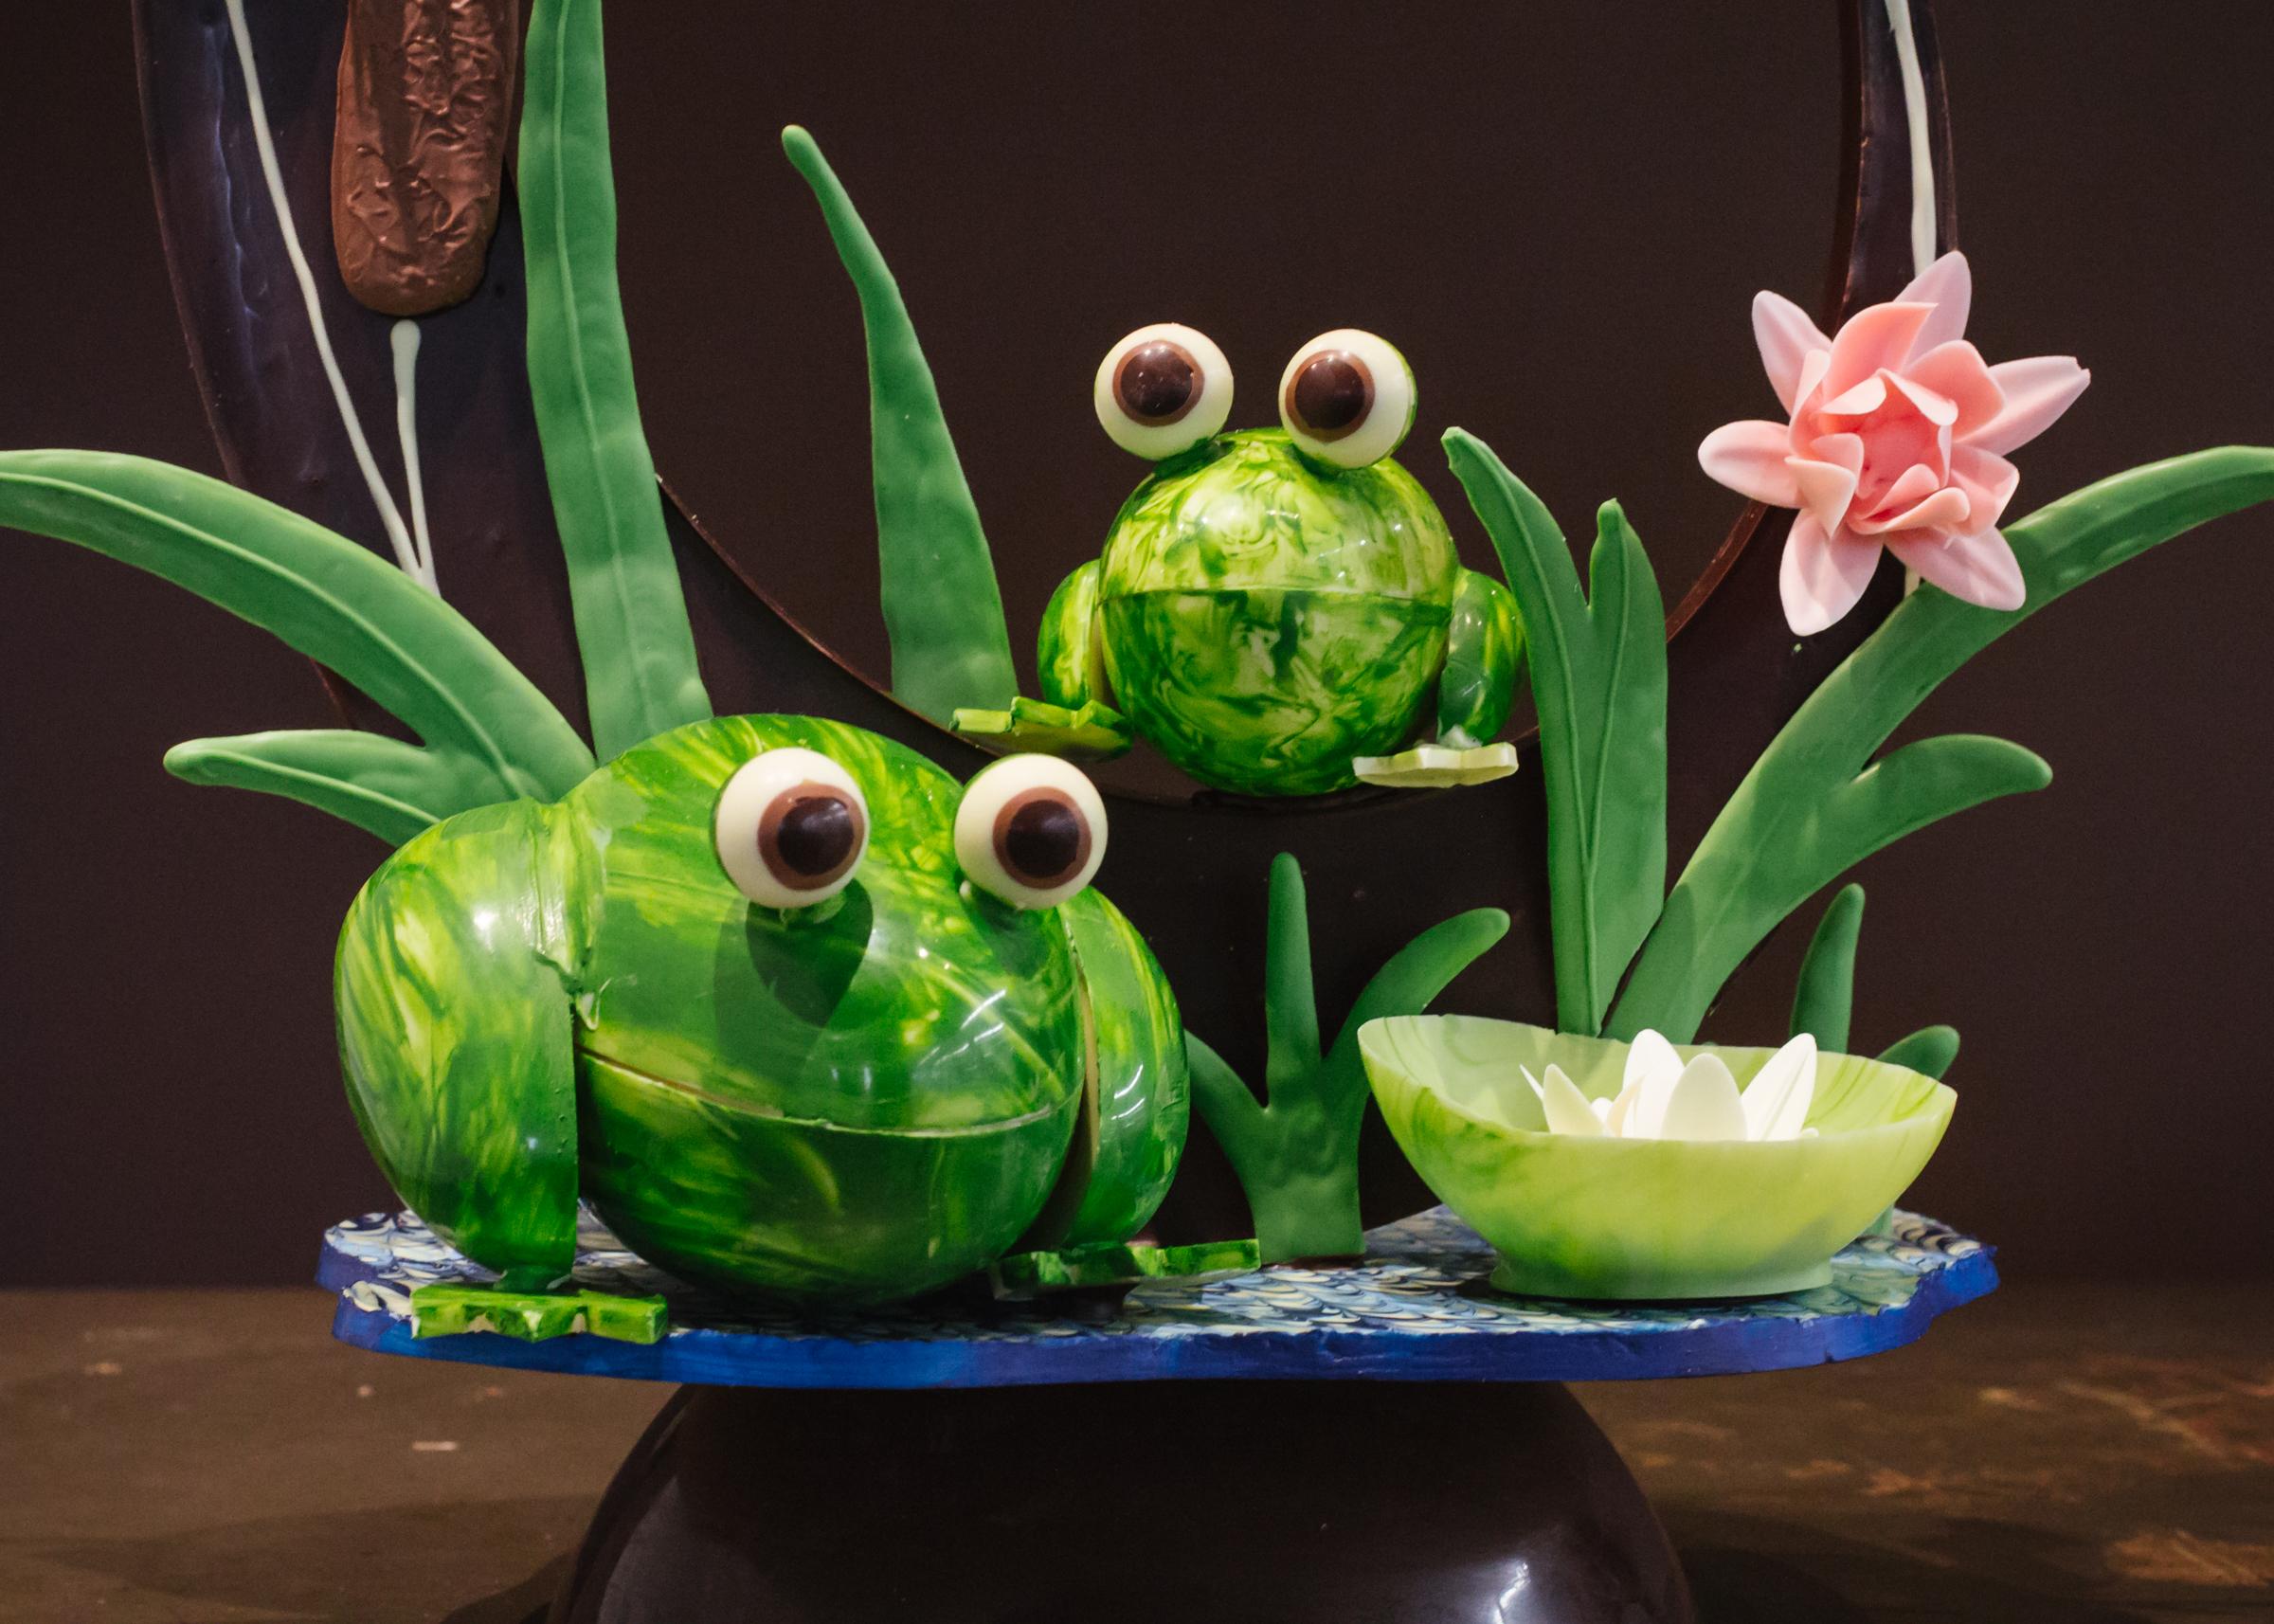 chocolate-frogs-8070.jpg